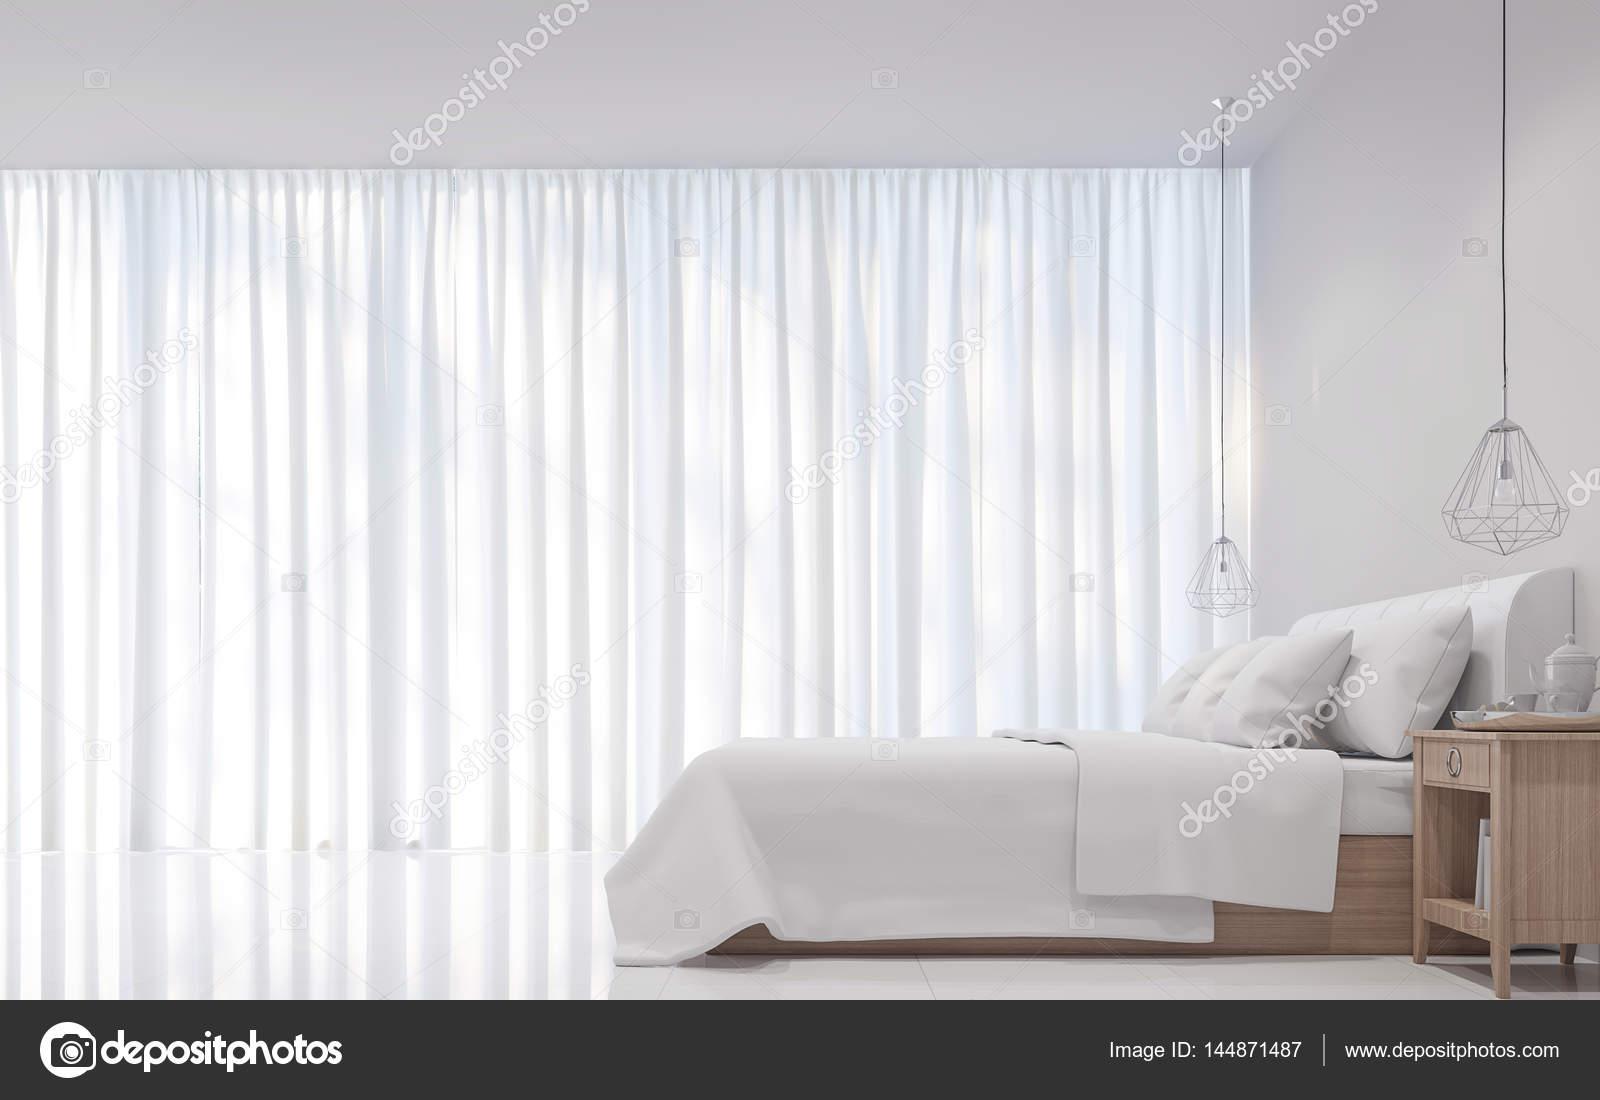 Moderne witte slaapkamer minimalistische stijl d rendering